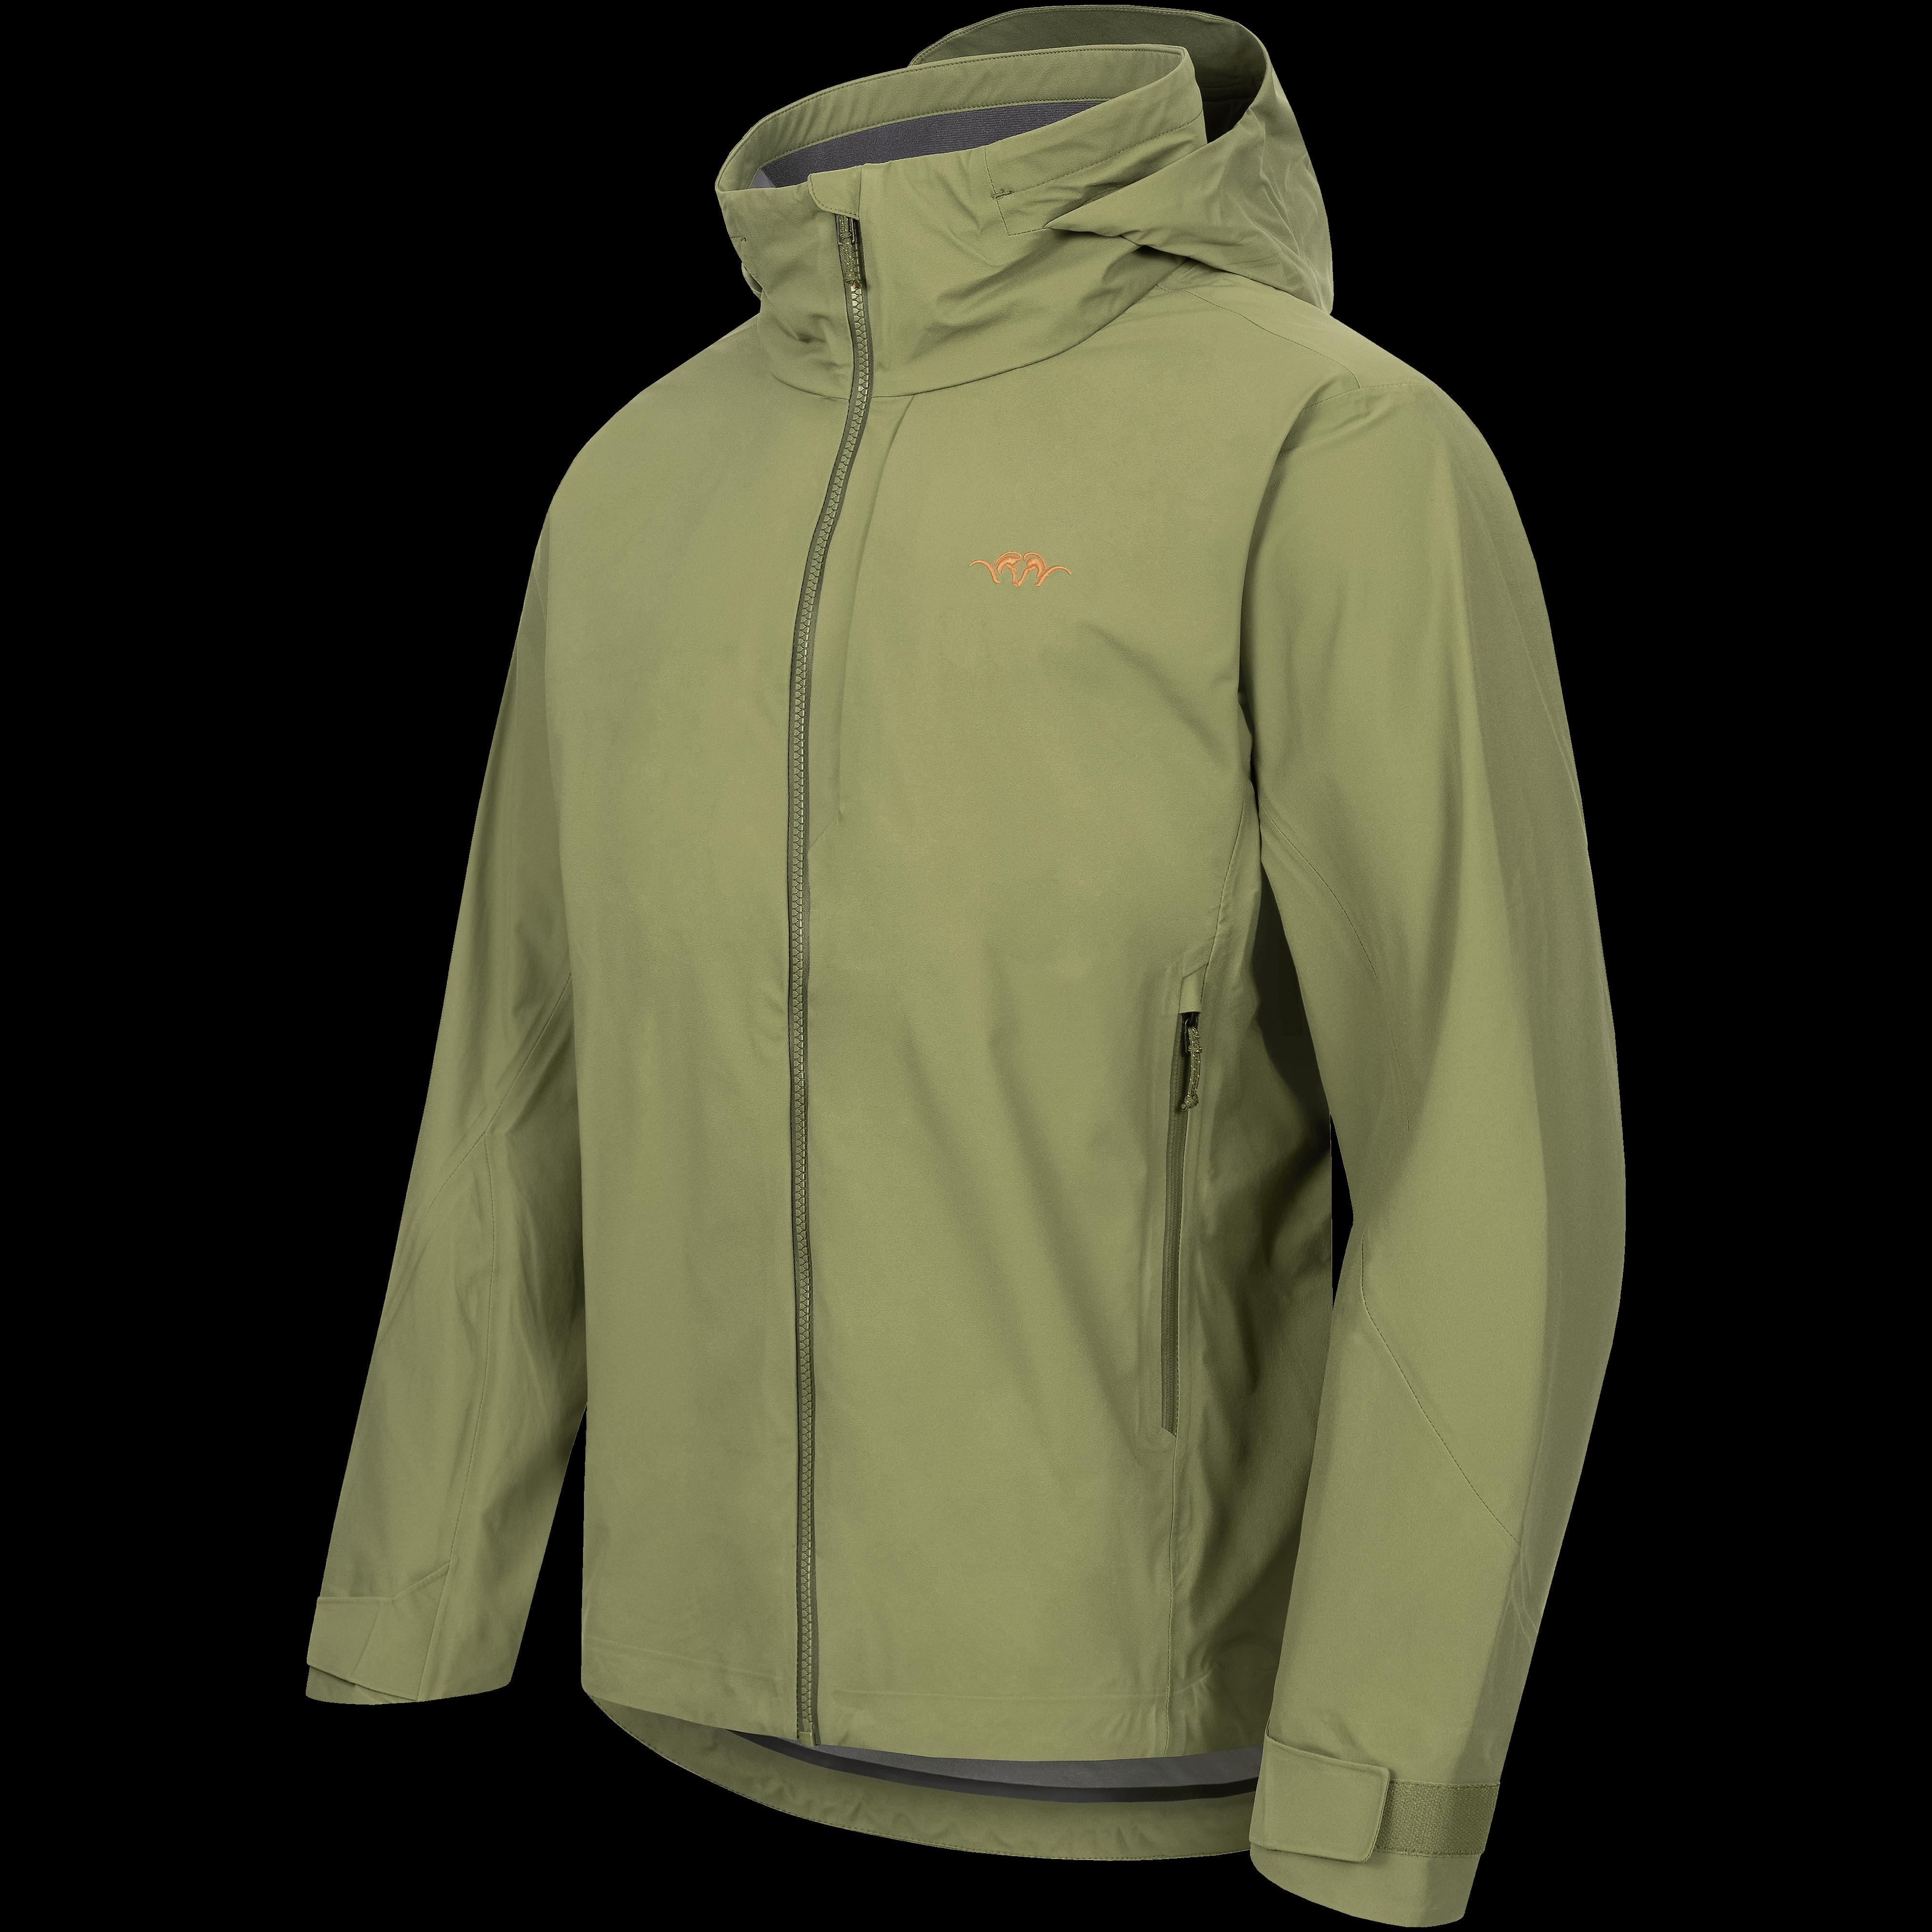 Venture 3L Jacket